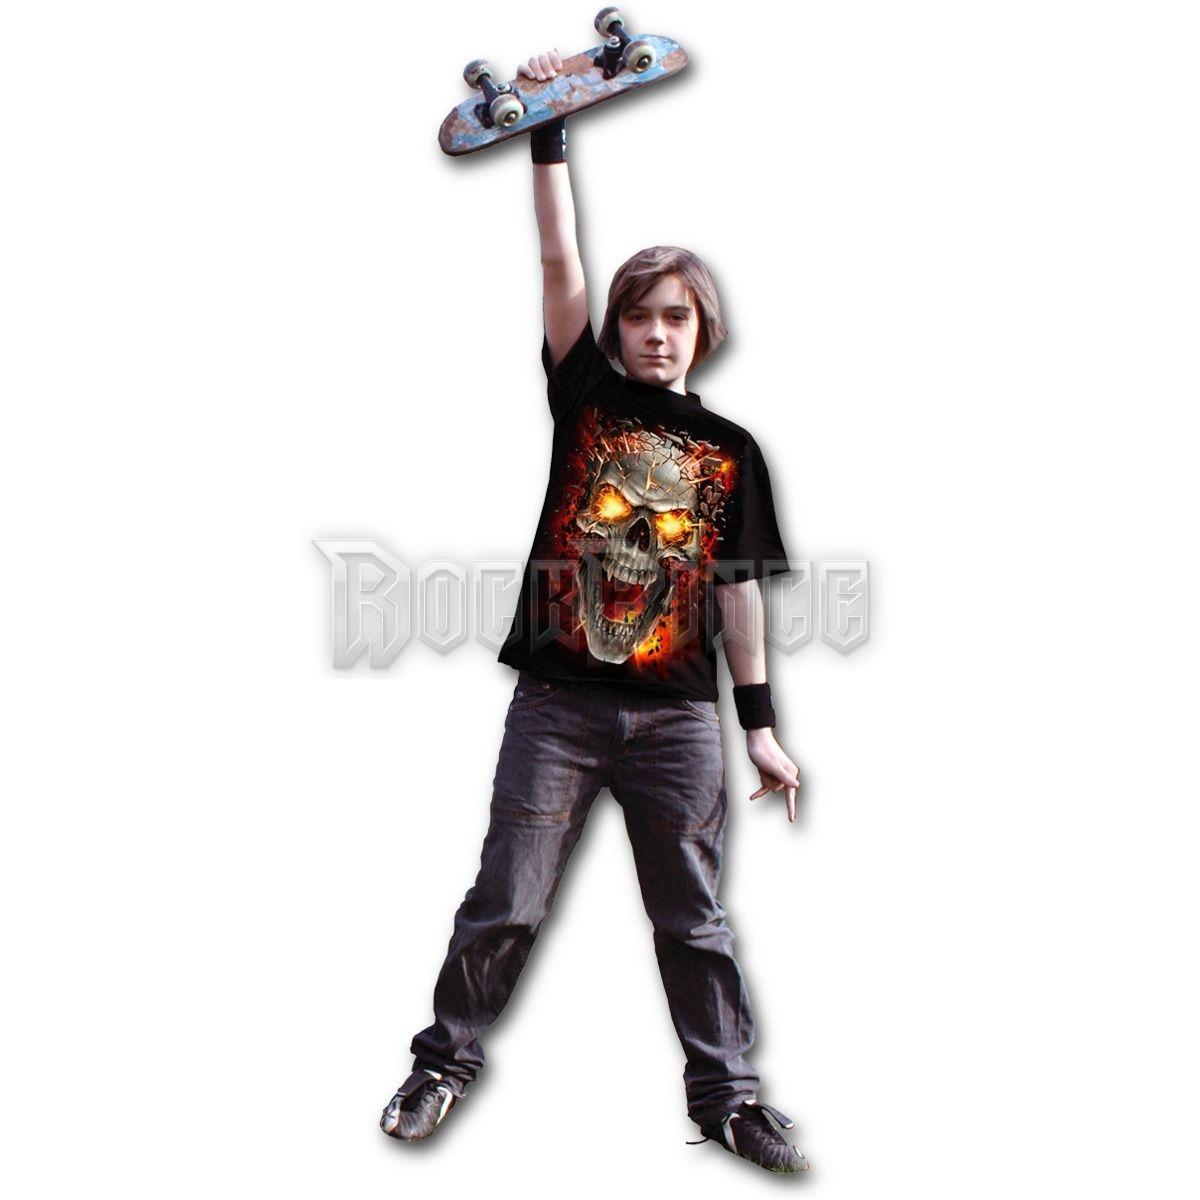 SKULL BLAST - Kids T-Shirt Black (Plain) - T152K101